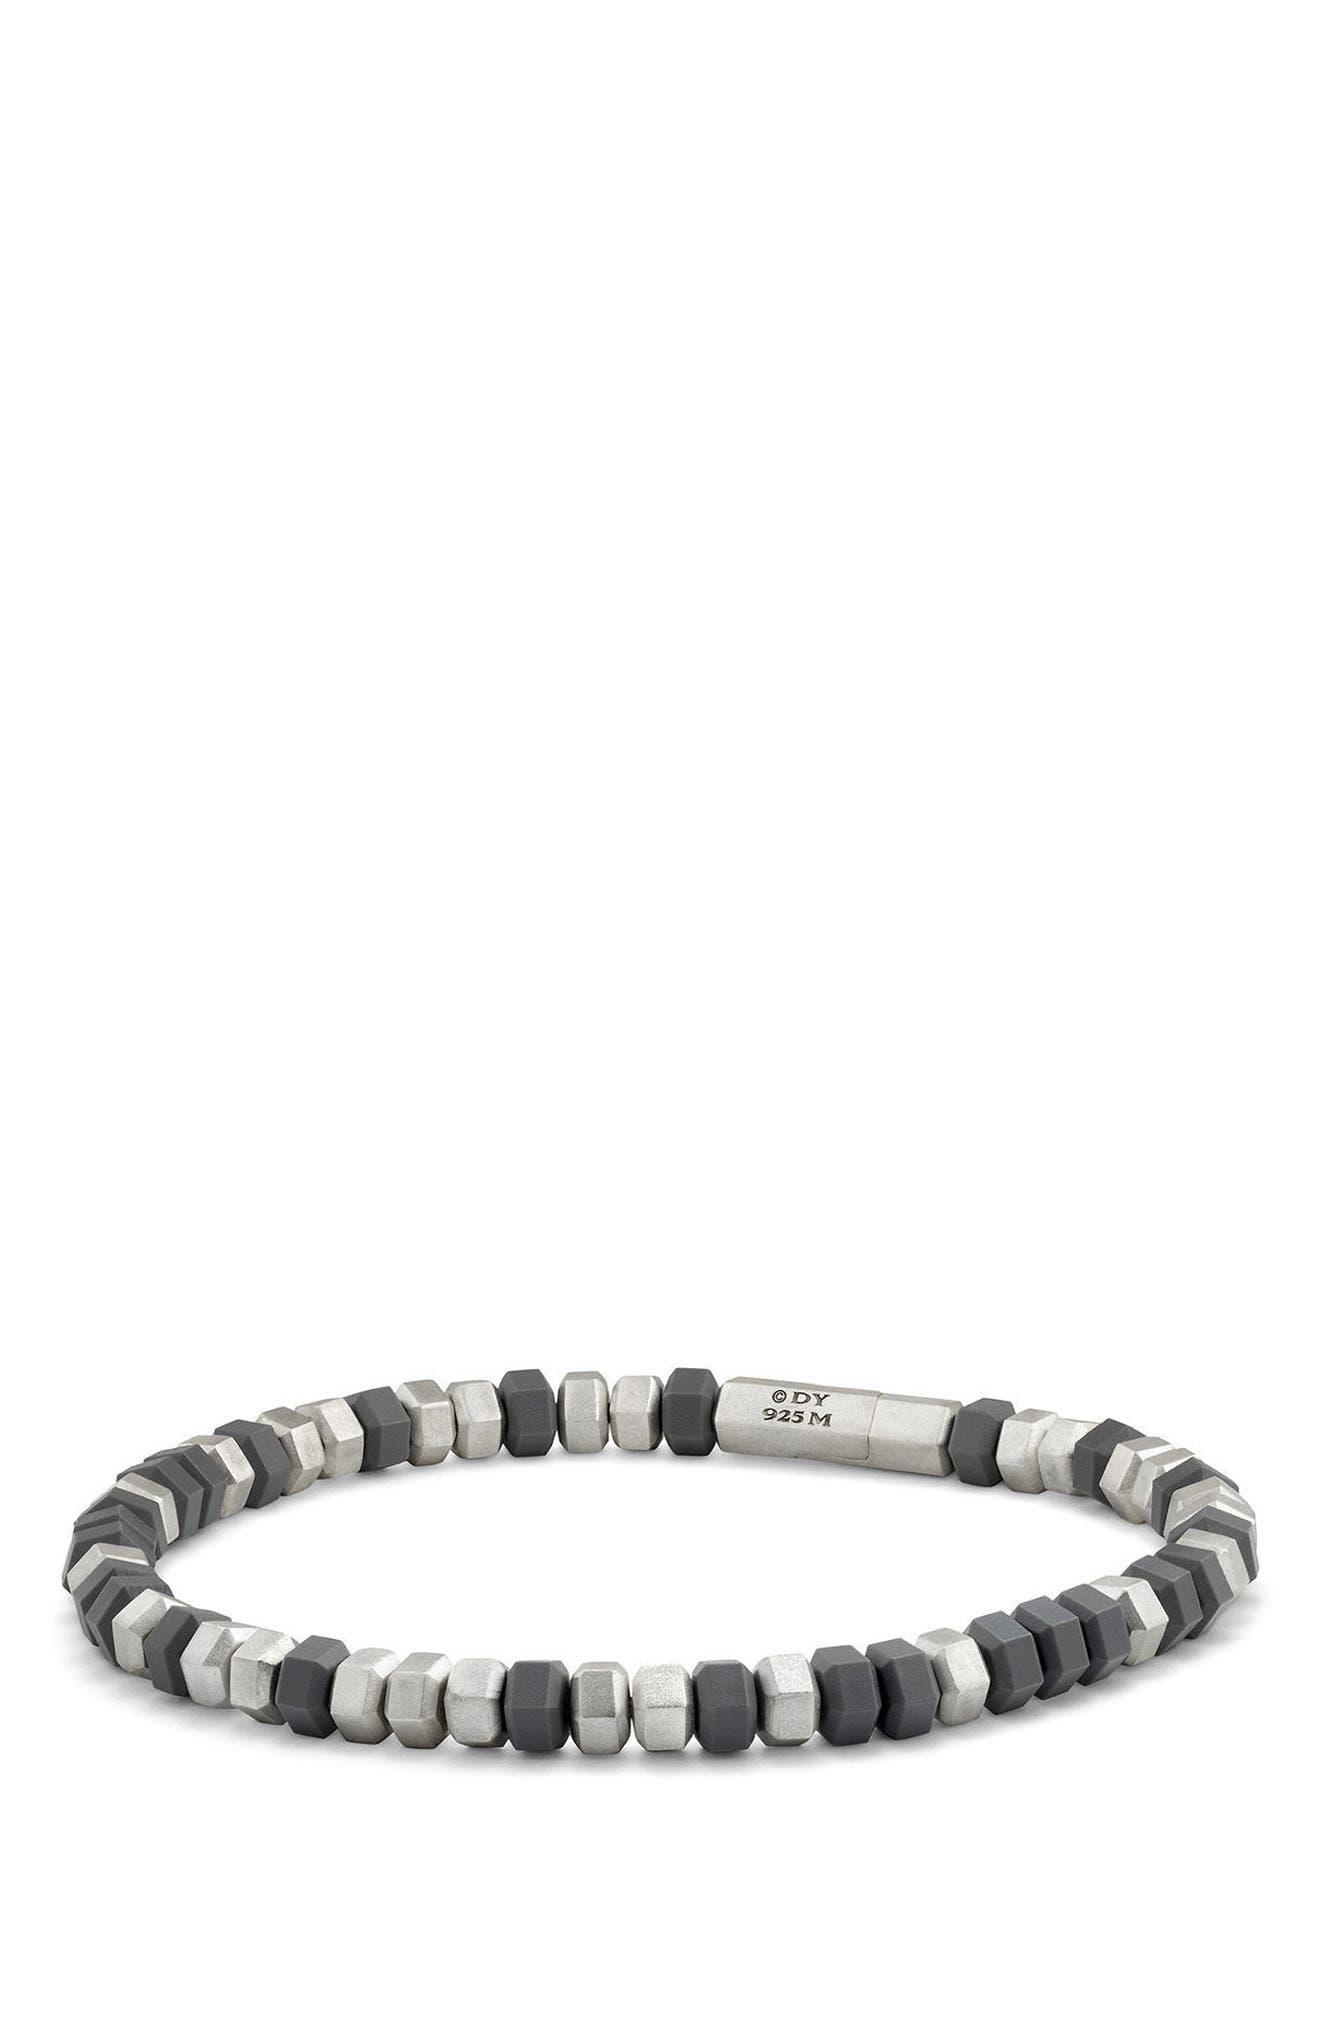 Alternate Image 1 Selected - David Yurman Hex Bead Bracelet